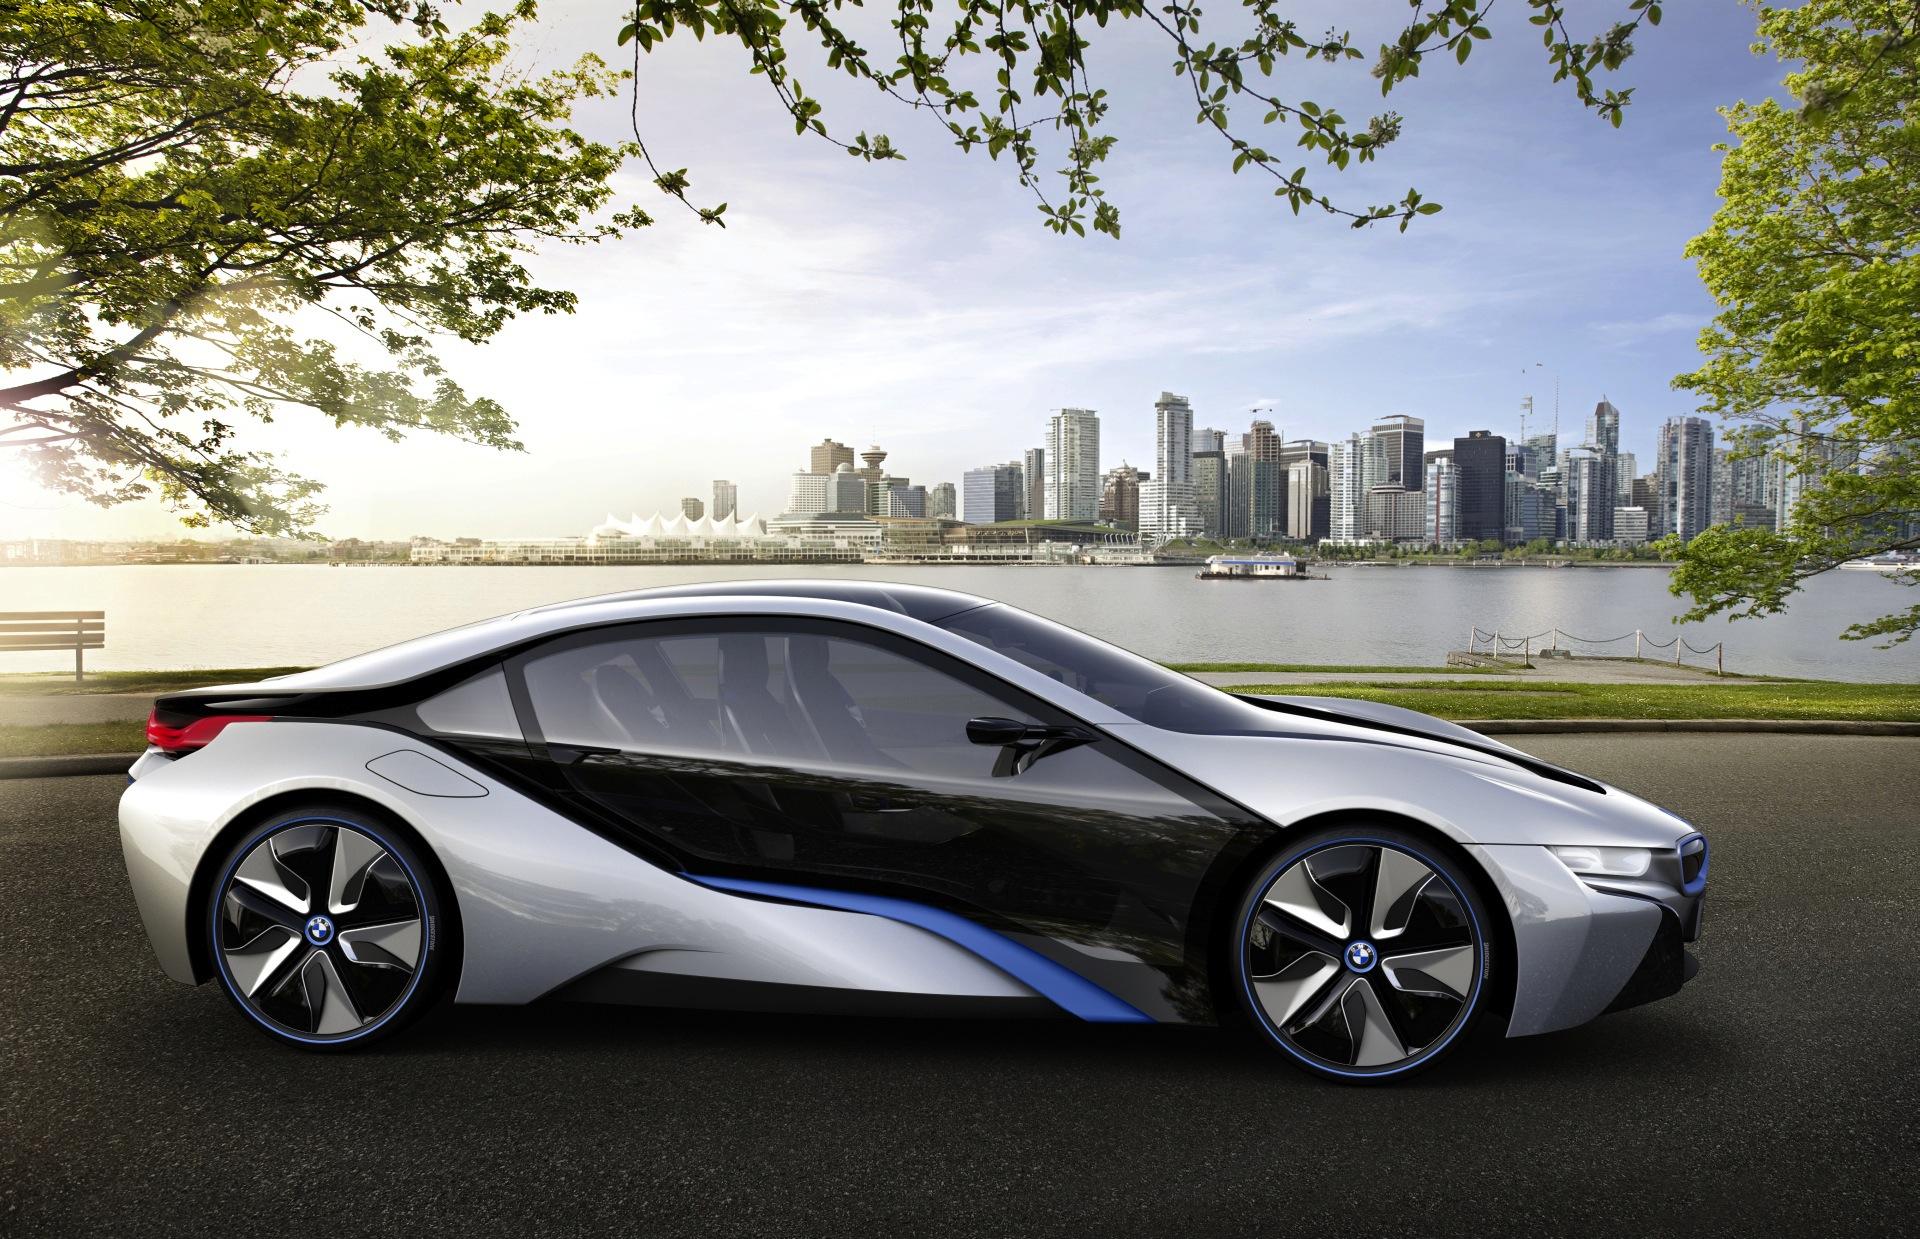 World Debut Bmw I8 Concept 0 60 Under 5 Seconds 78mpg